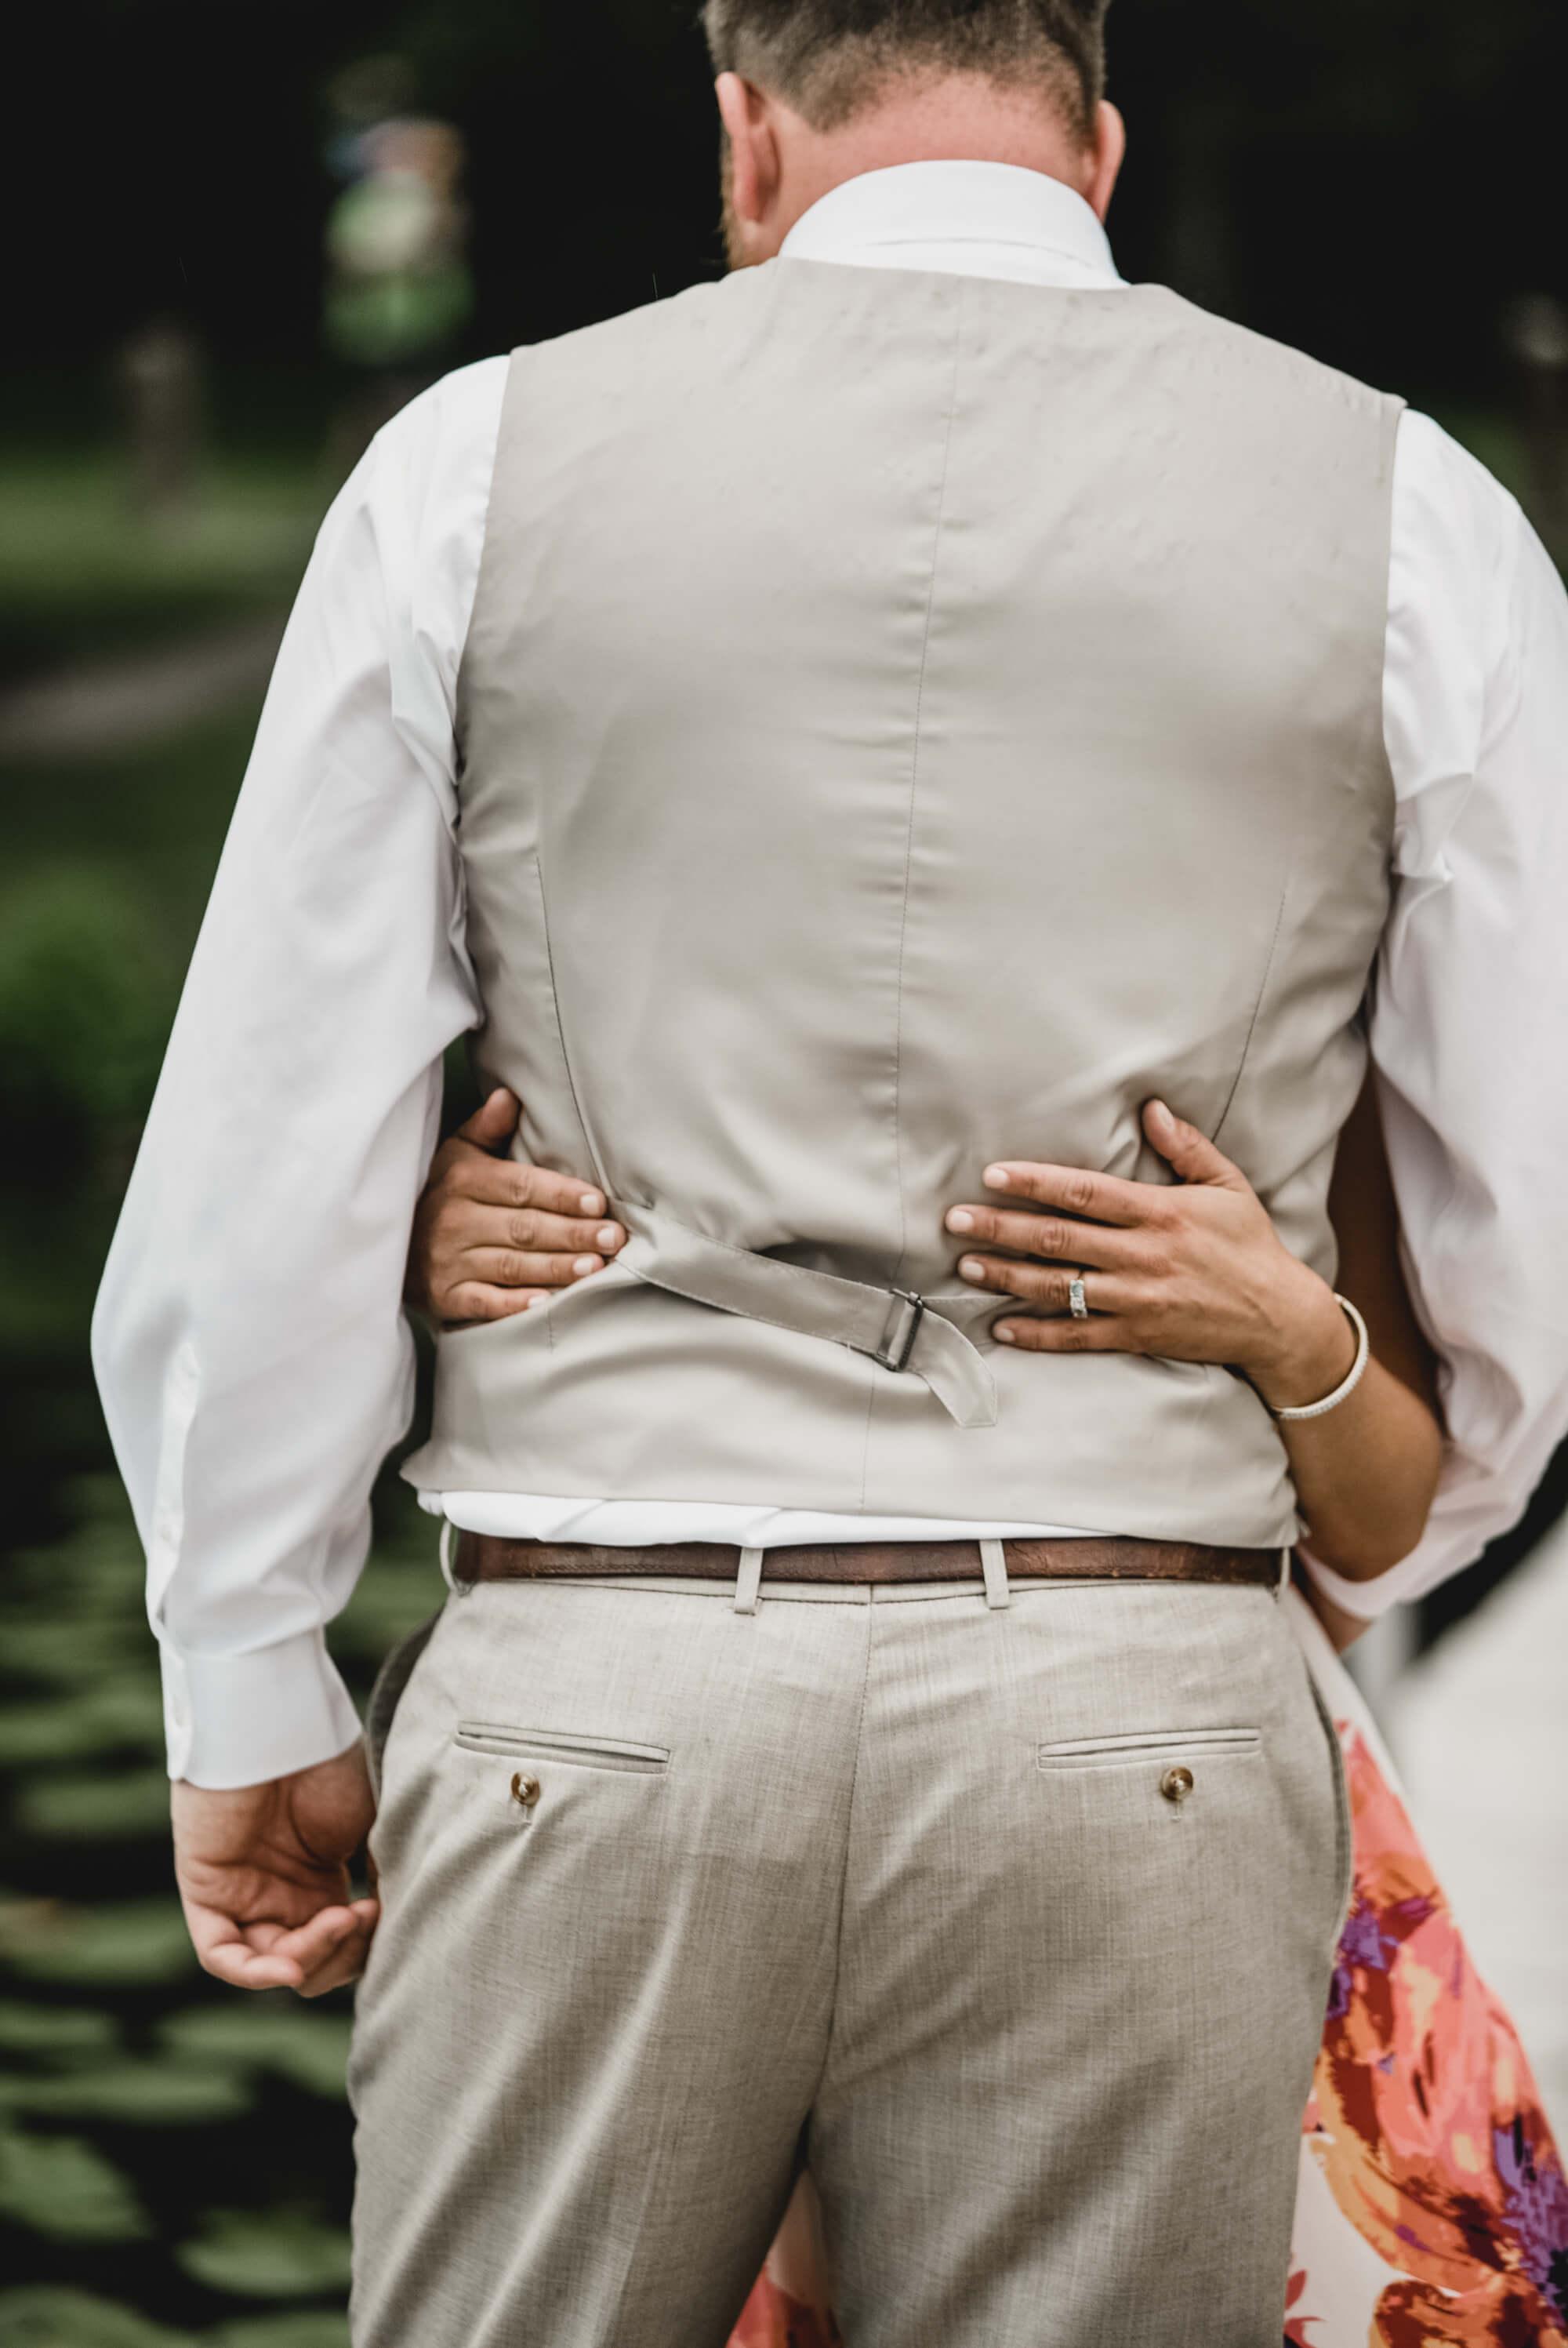 engle-olson-maddy-pat-mn-wedding-photography-3.jpg